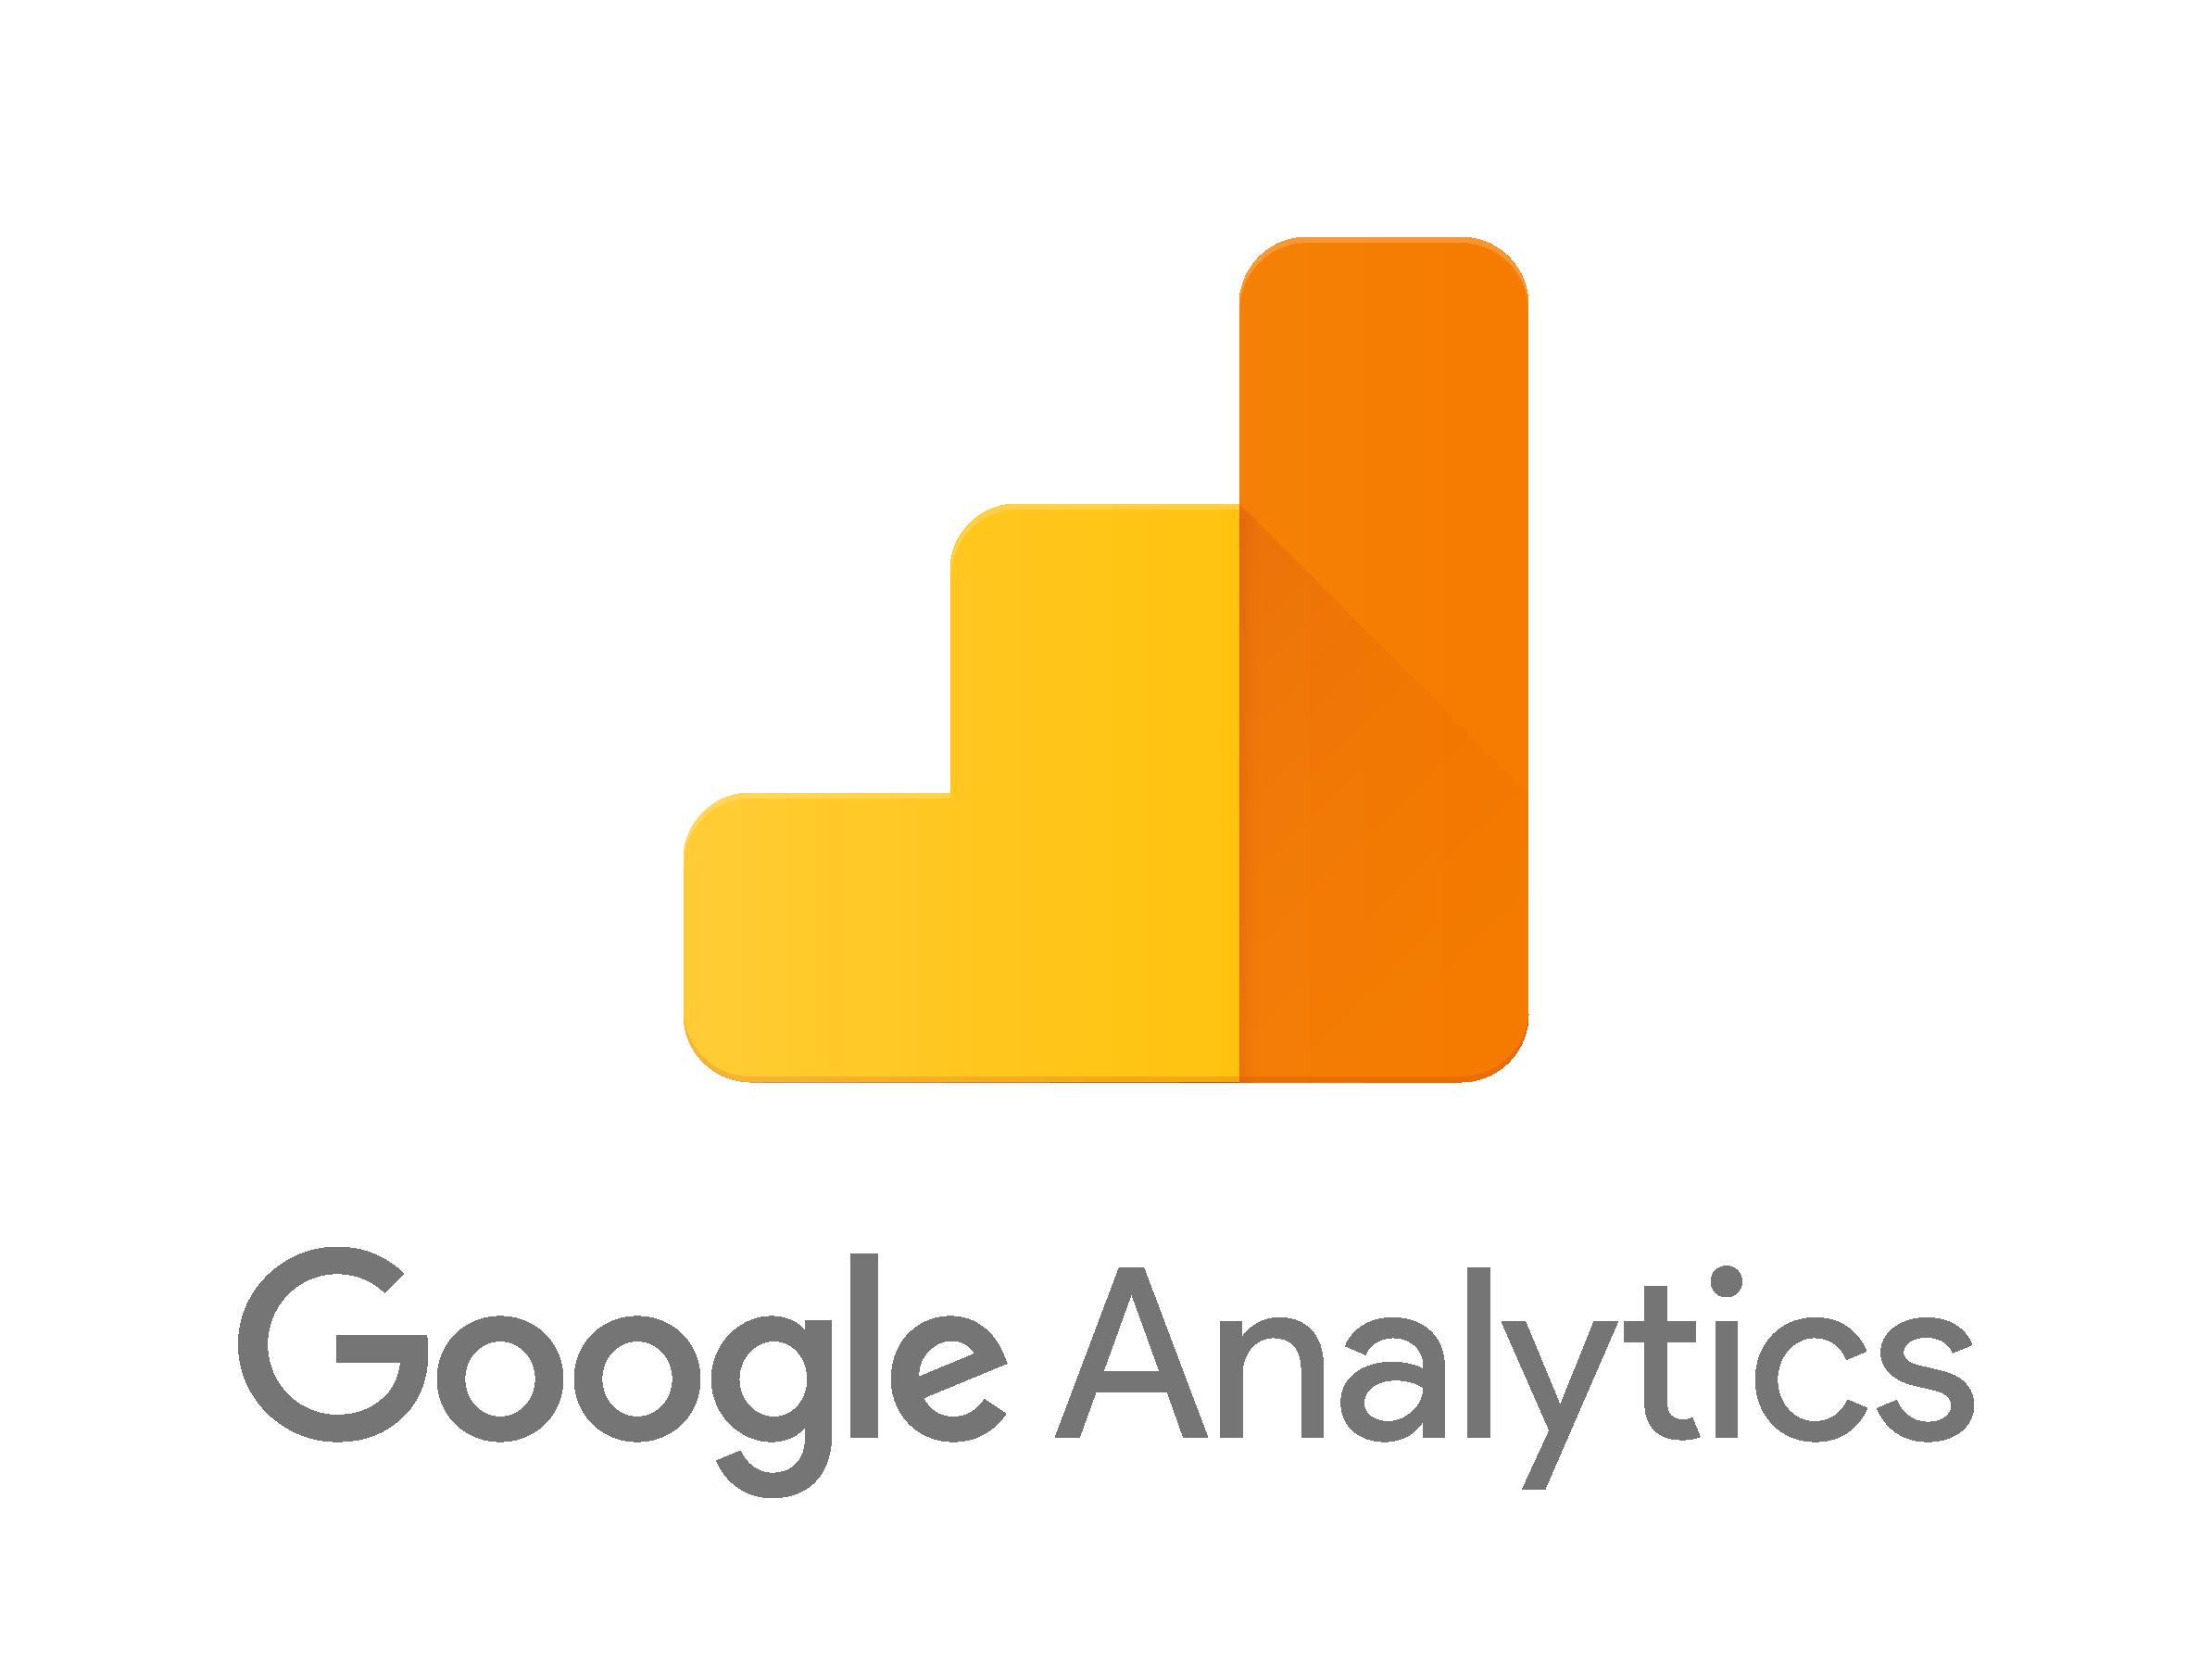 google analytics image.png